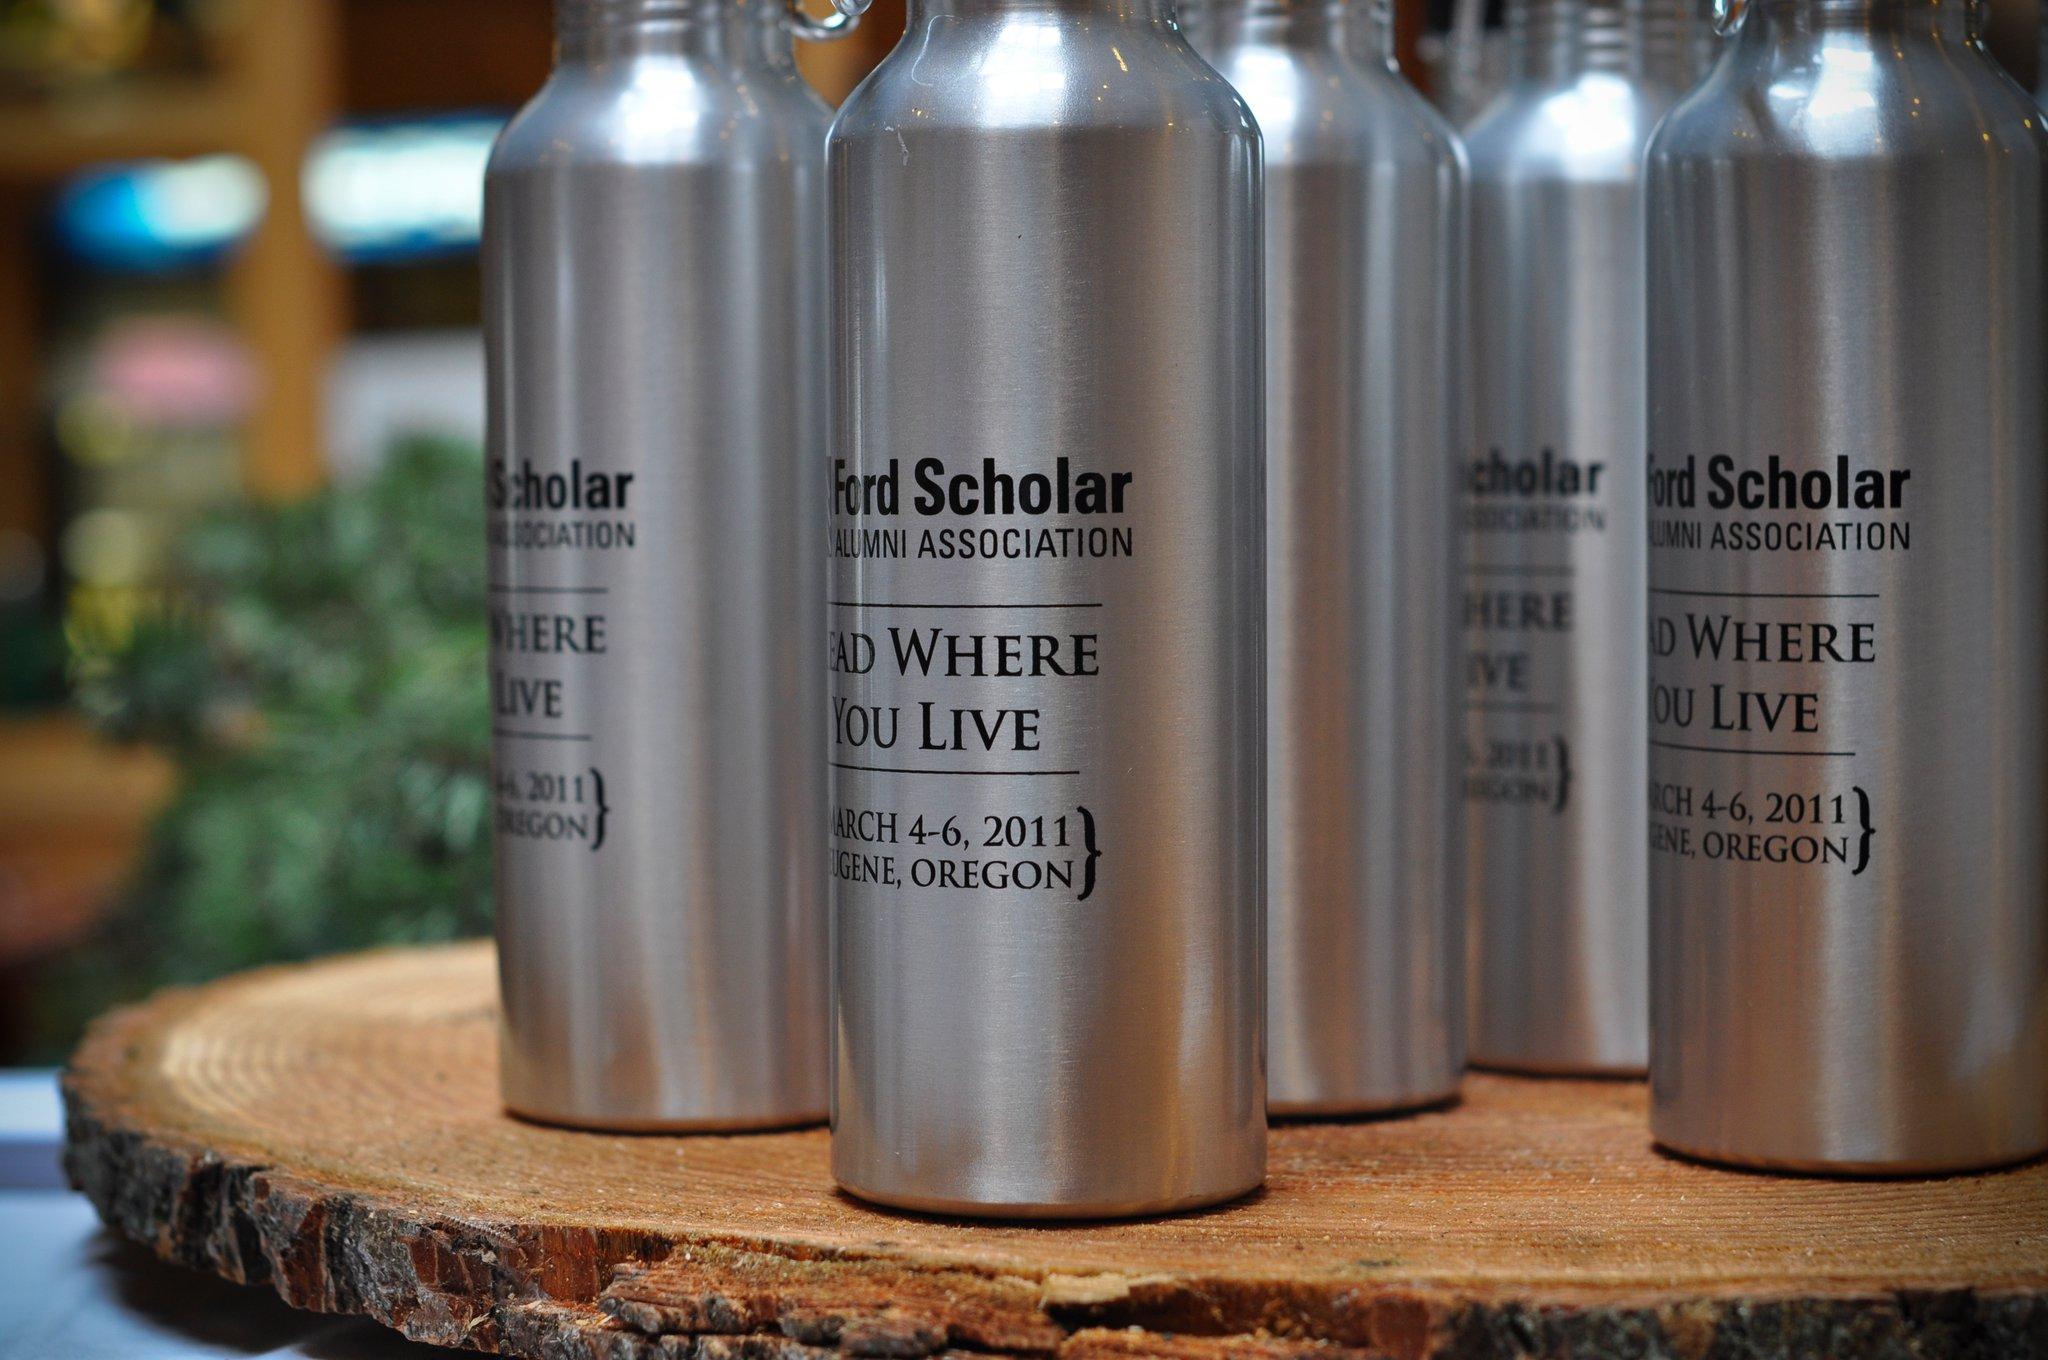 Lead Where You Live, Ford Scholar Alumni